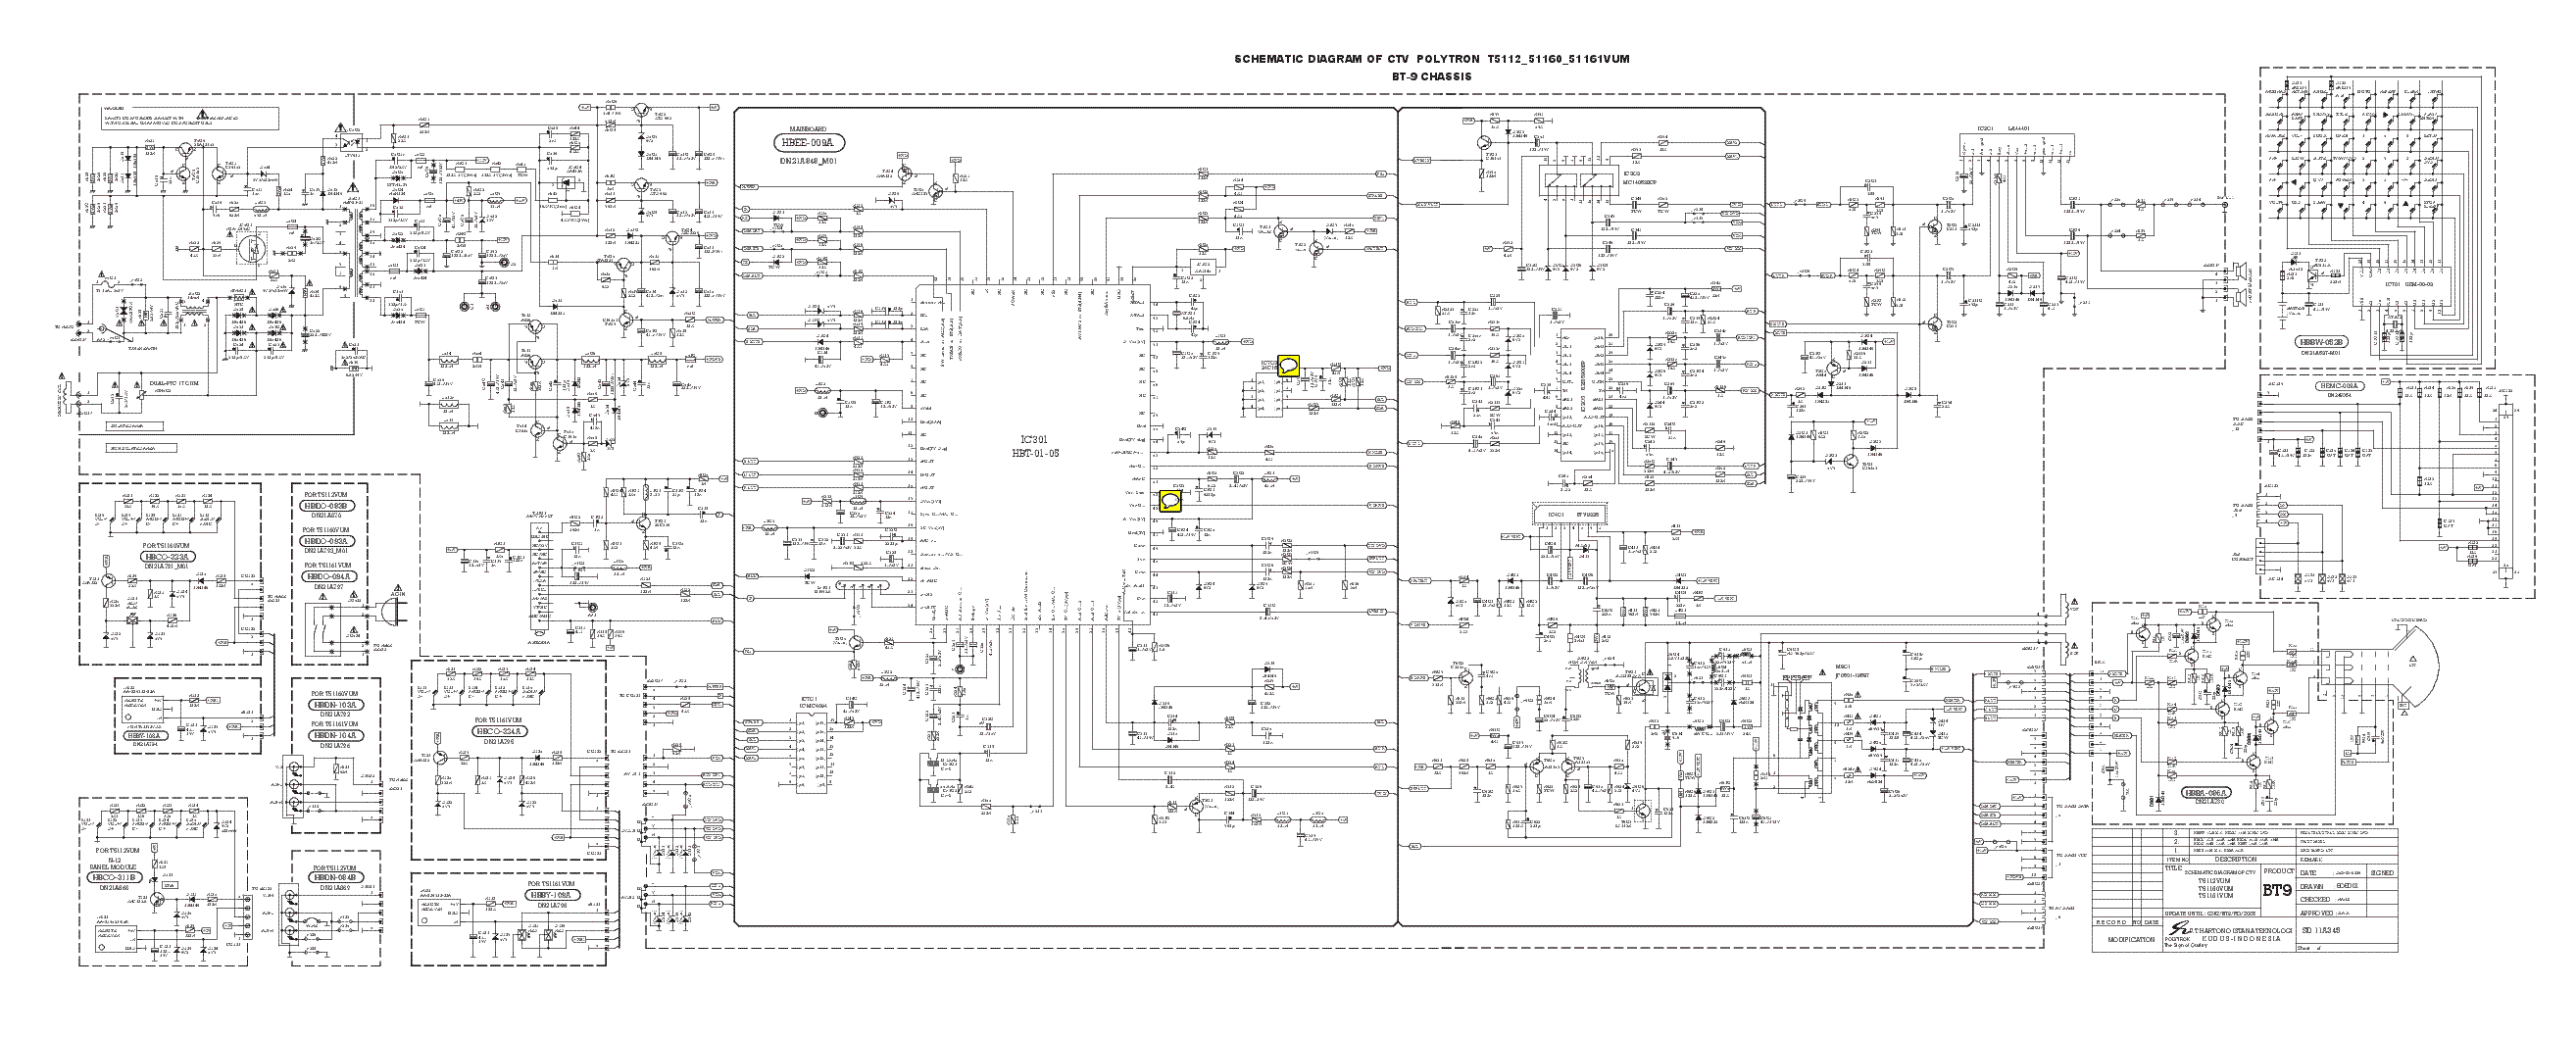 Polytron Tv Schematic Diagram Archive Of Automotive Wiring Tube Light Pdf T5112 51160 51161vum Bt9chs Sch Service Manual Download Rh Elektrotanya Com